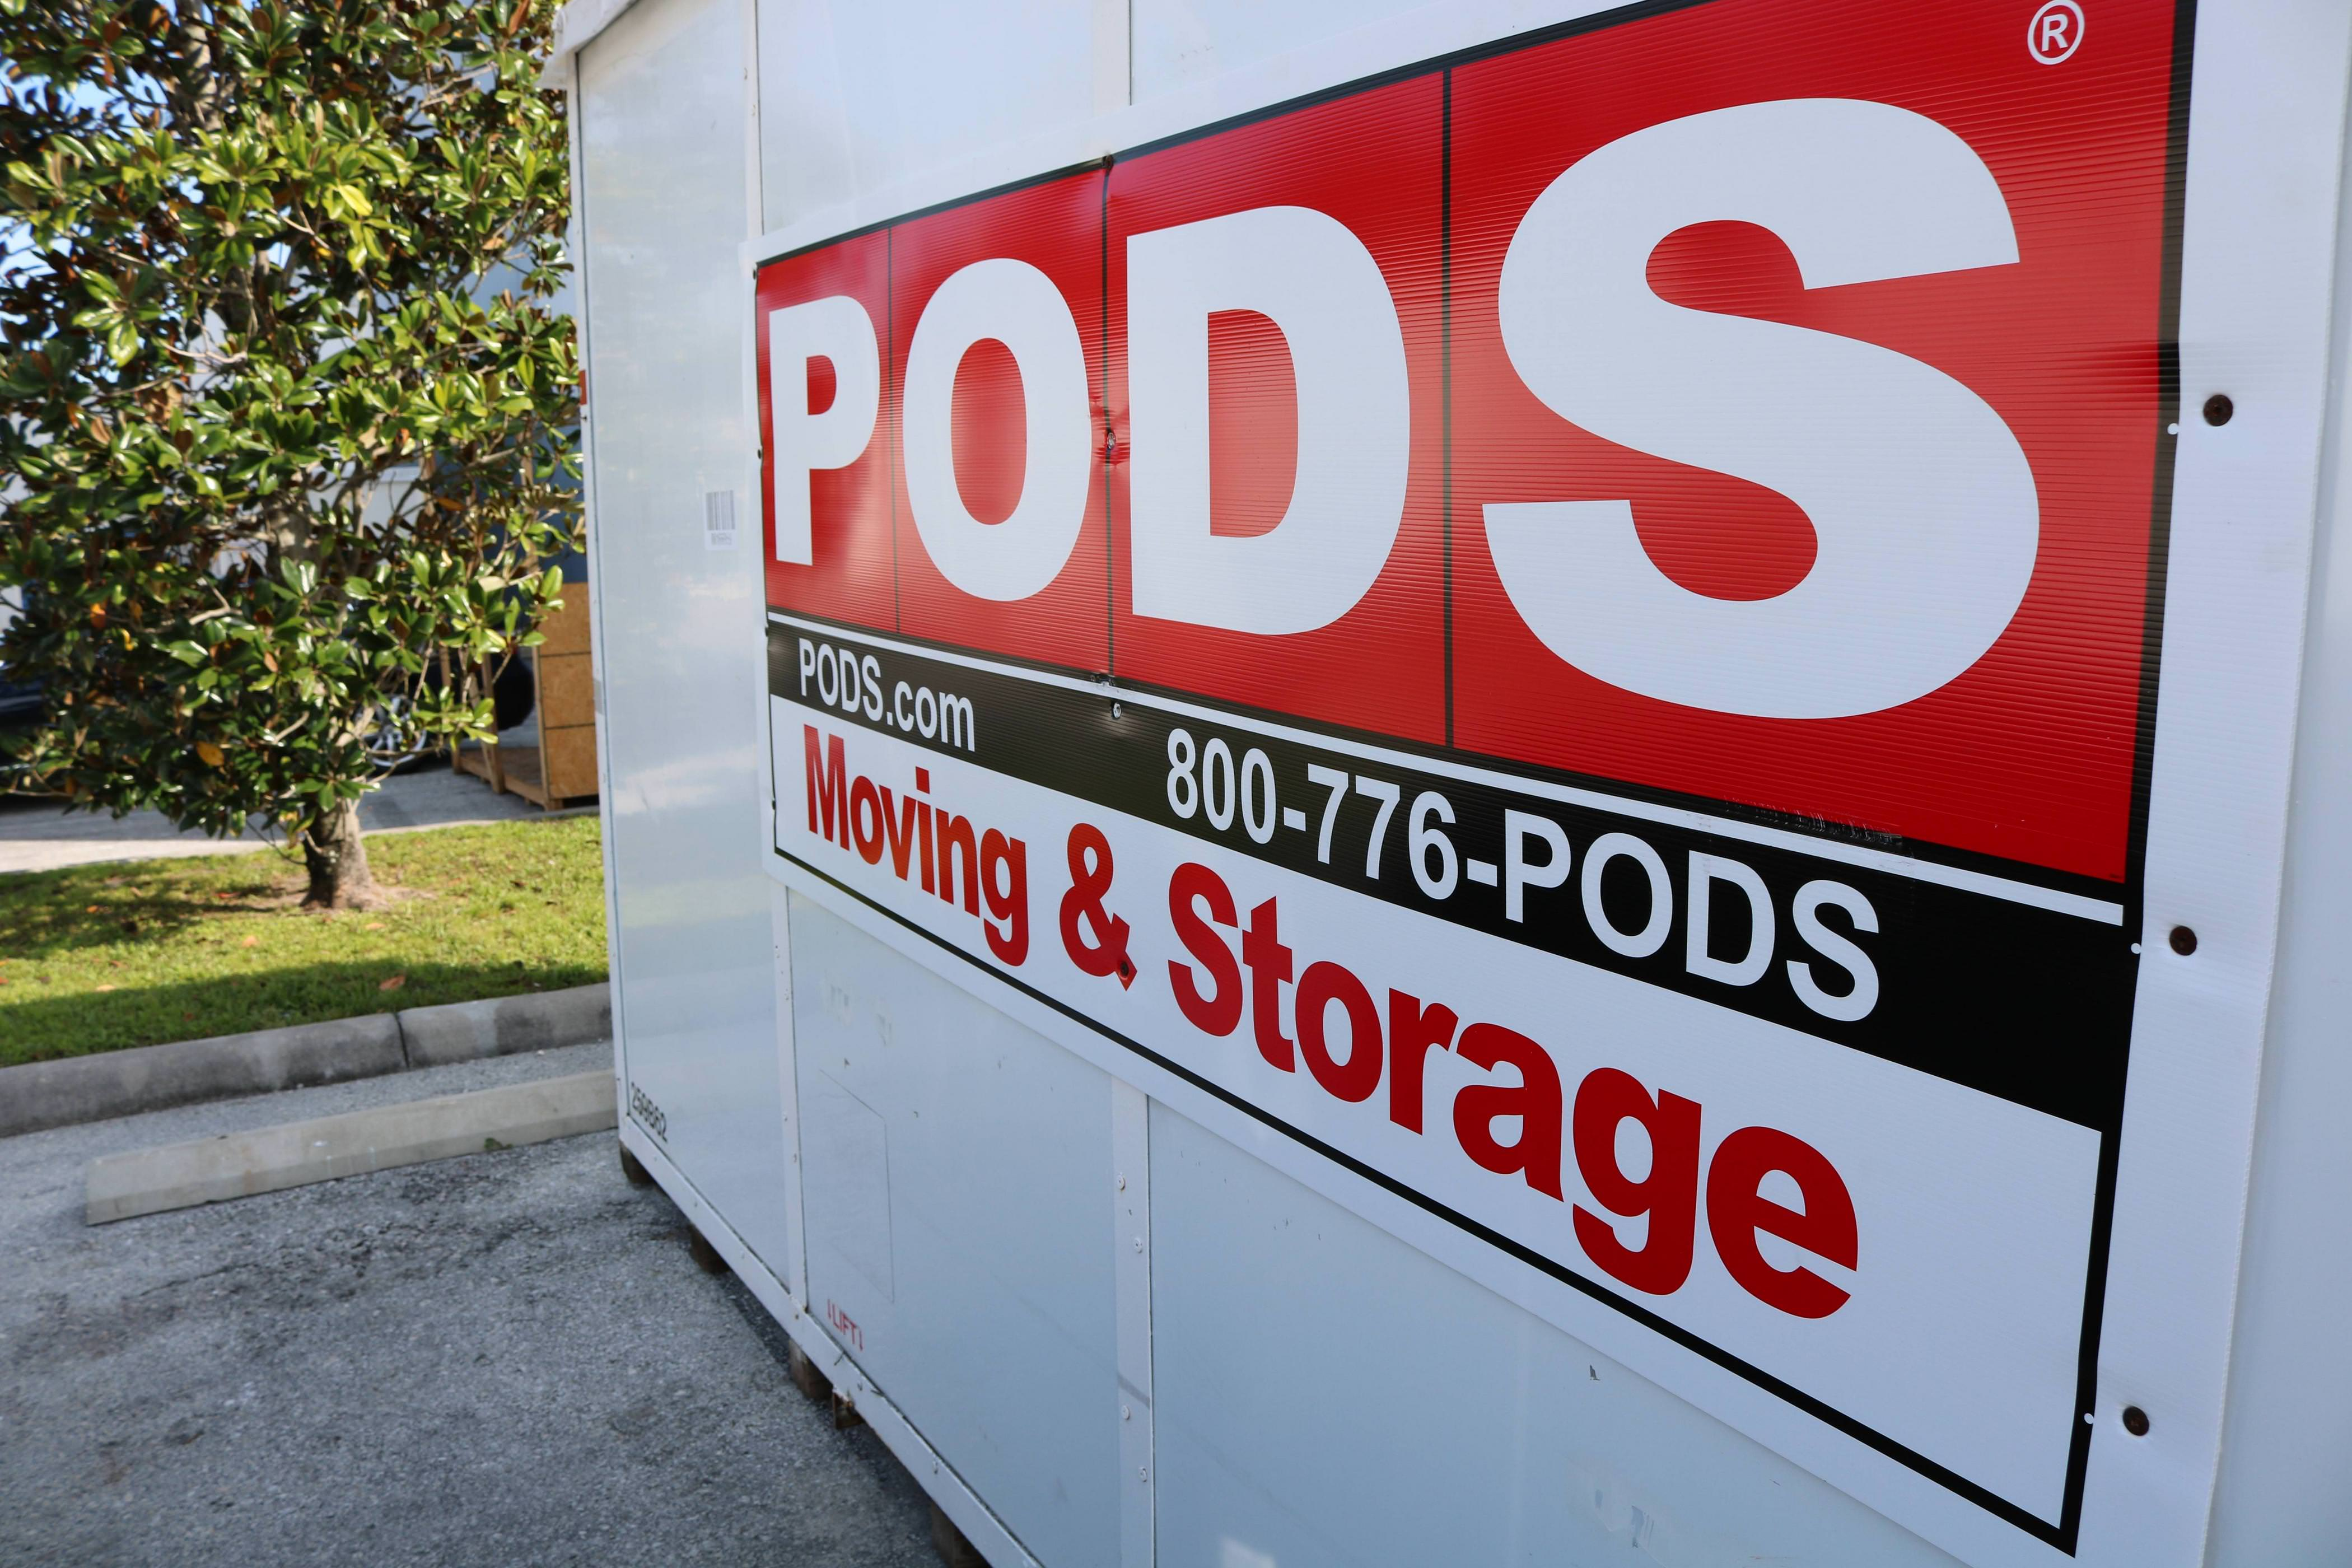 PODS - North Las Vegas, NV